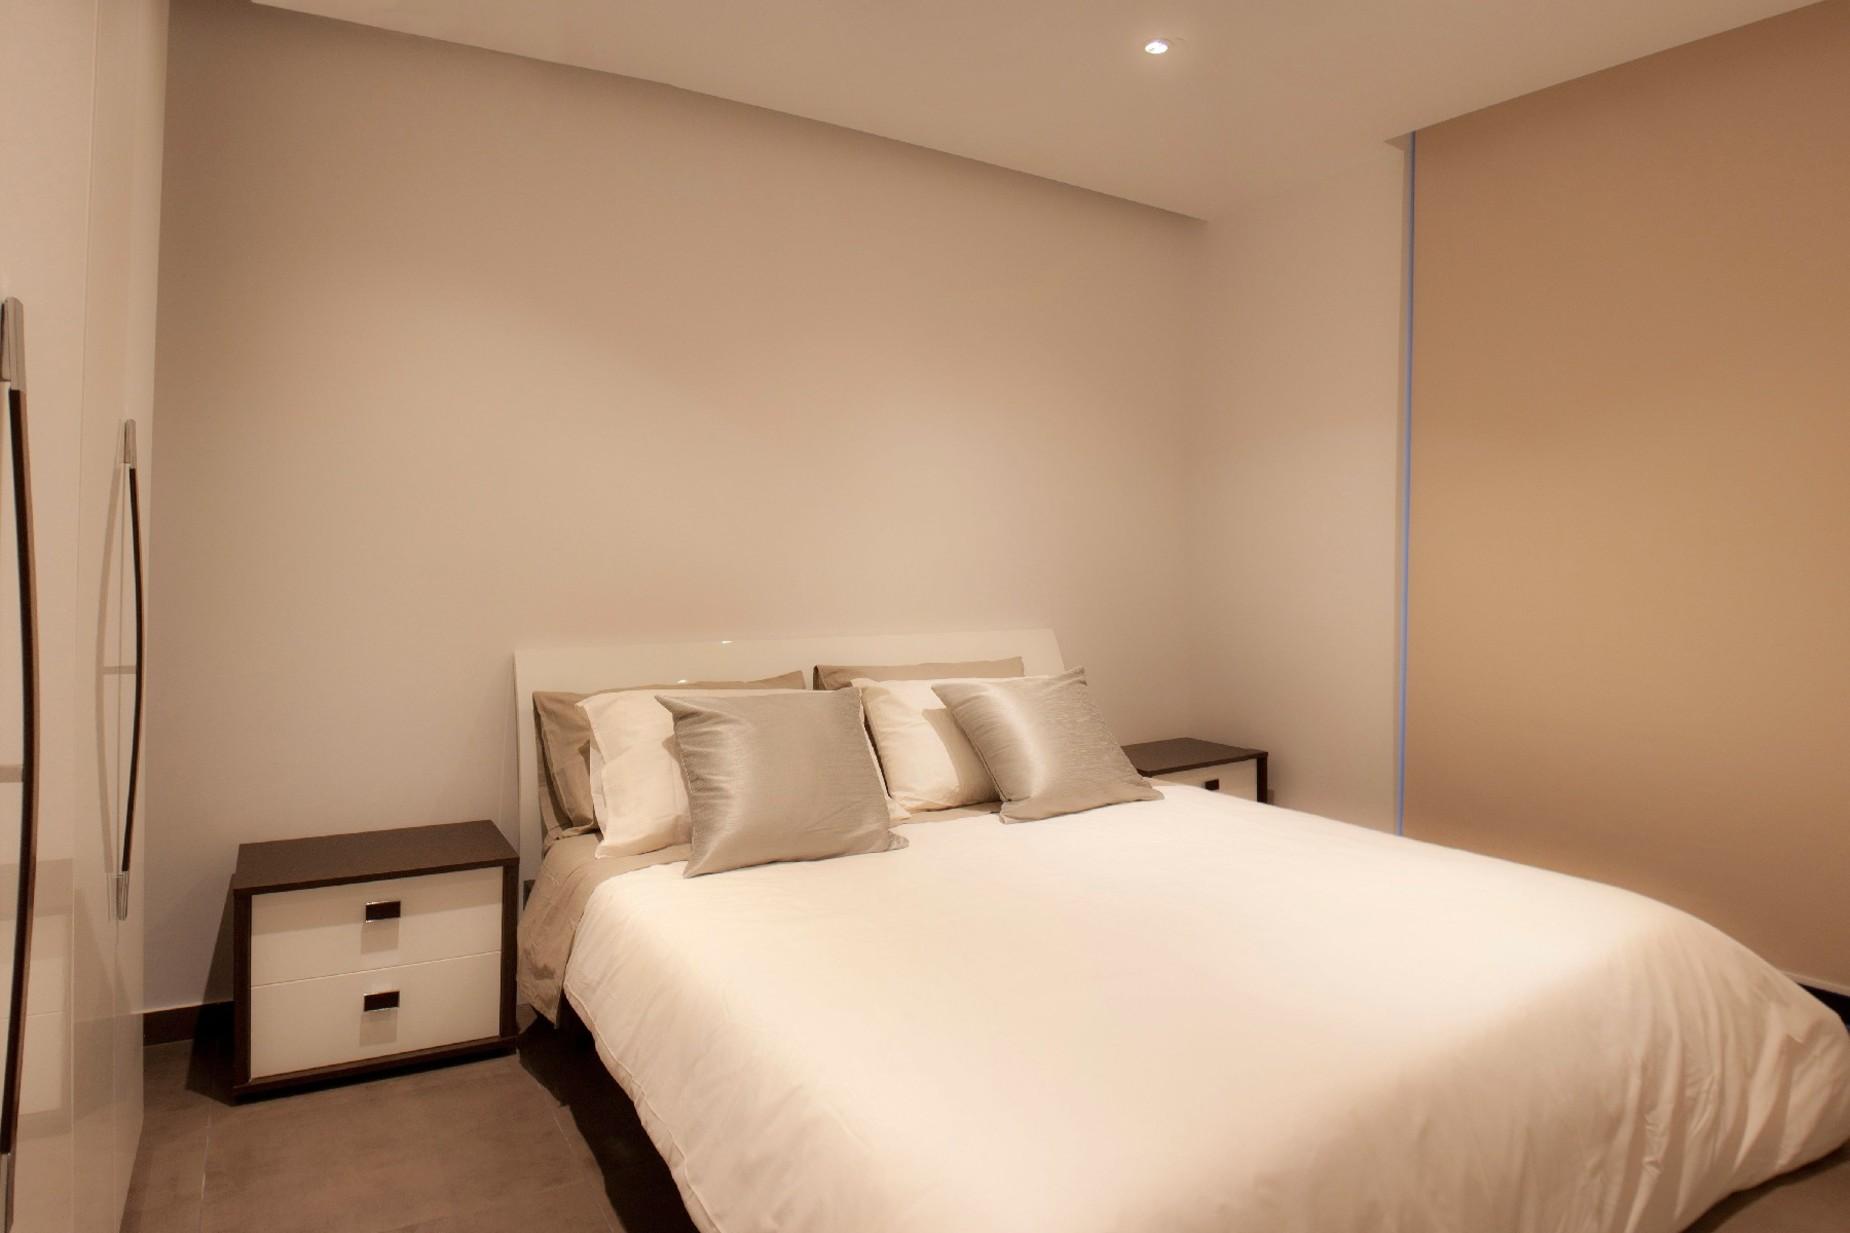 2 bed Apartment For Rent in Sliema, Sliema - thumb 6